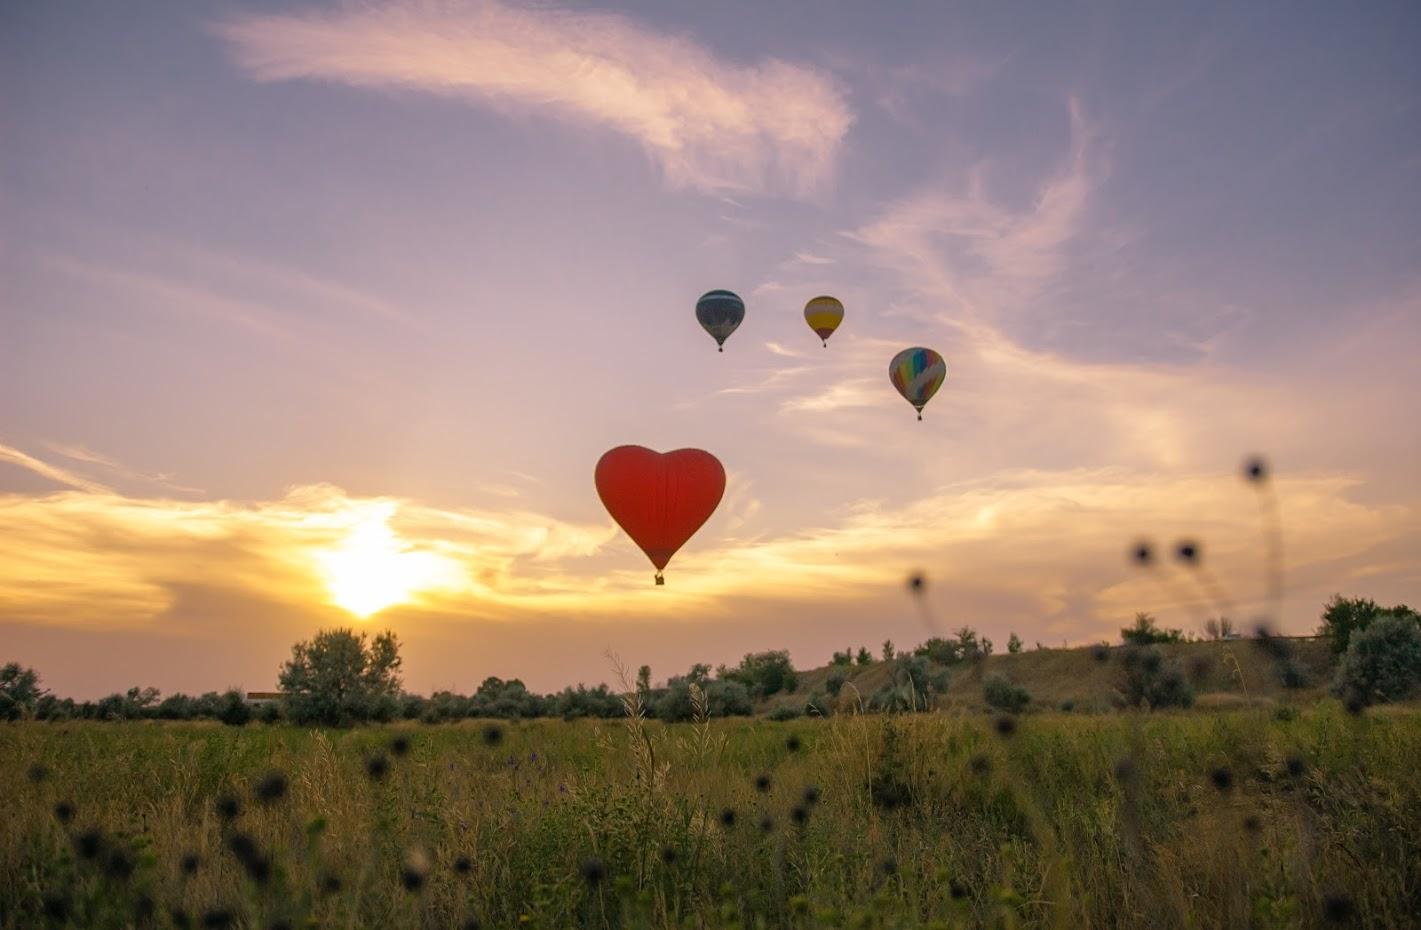 О полётах на воздушном шаре